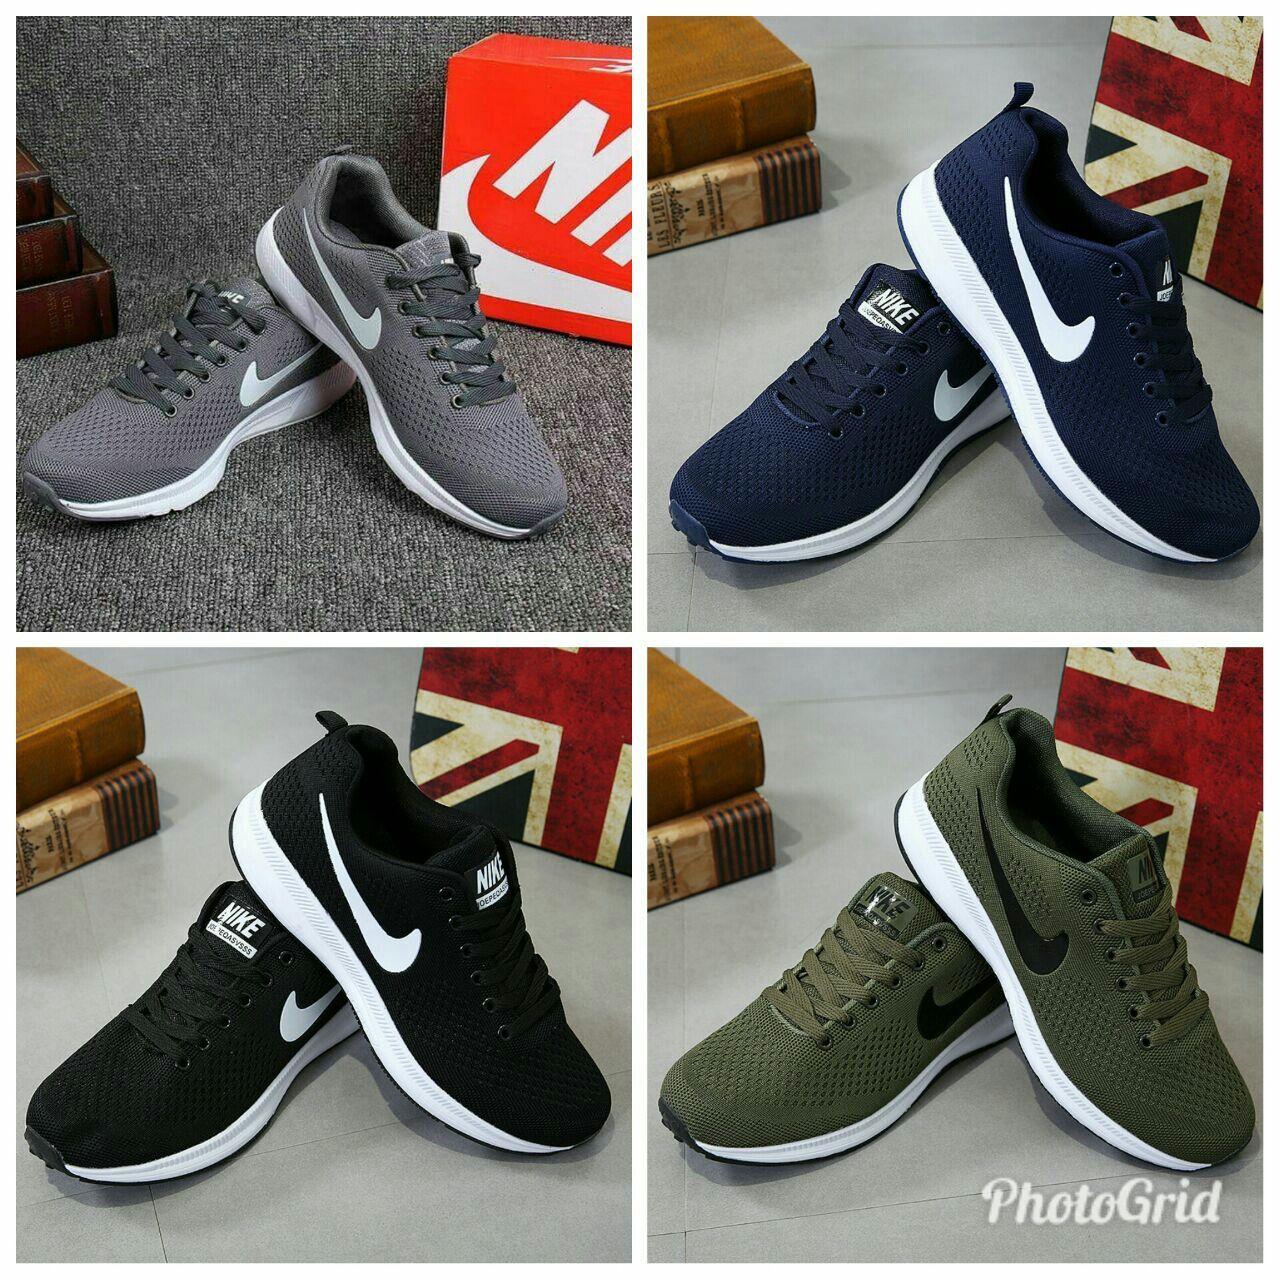 Sepatu Nike S558 A830 Men Semioriginal Heels 2 5cm Berat 7